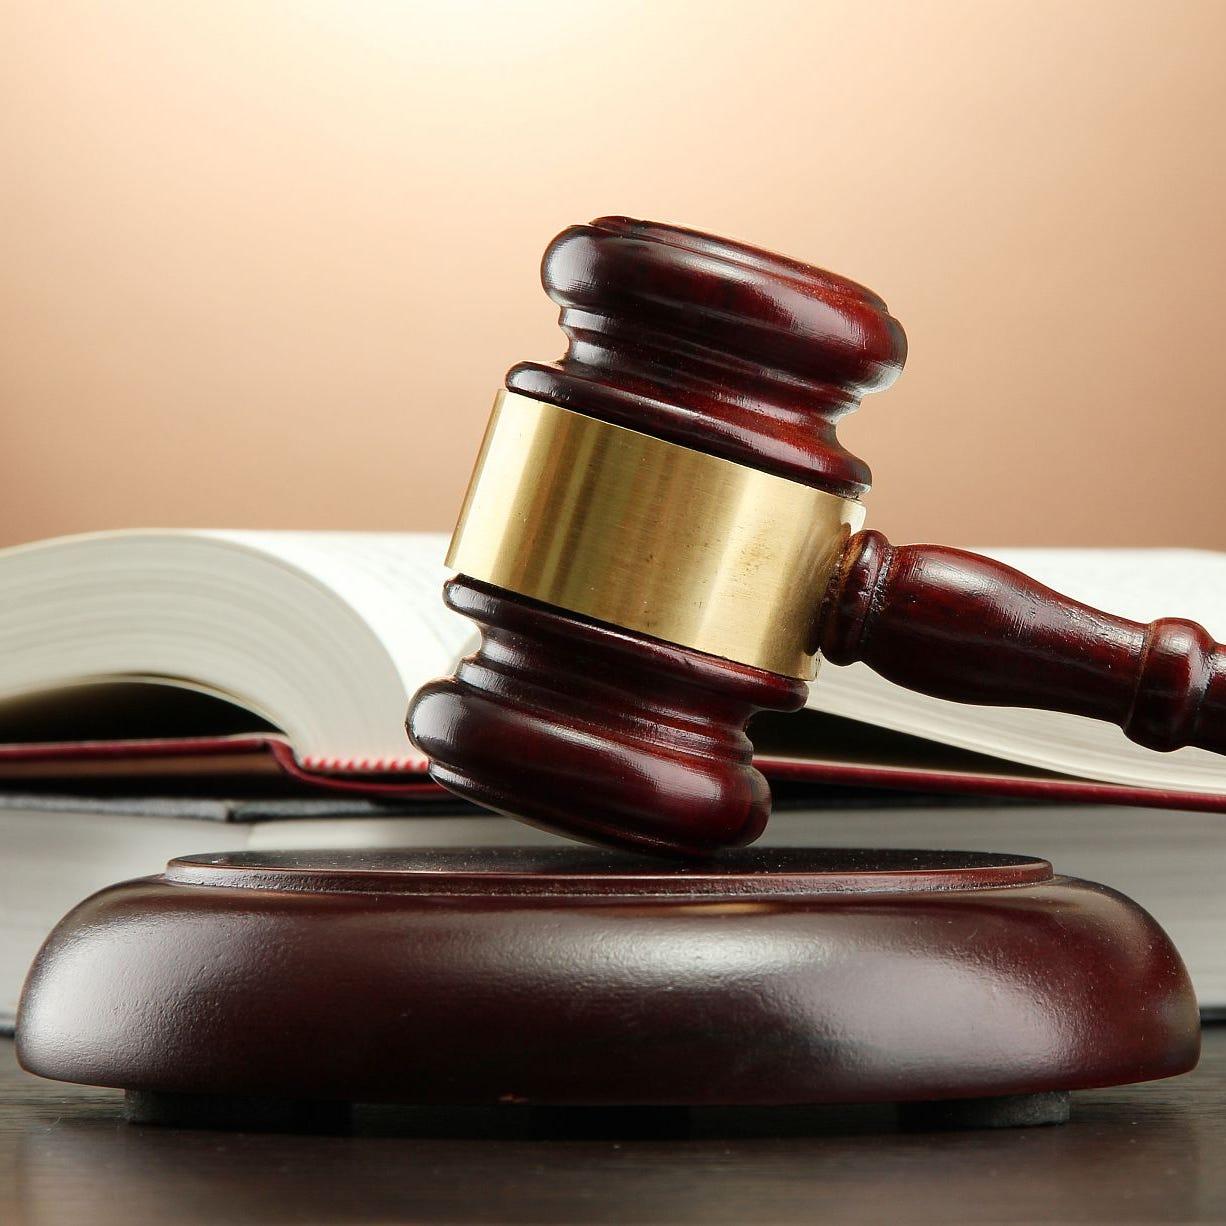 Judge orders former Iraqi detainee returned to U.S.